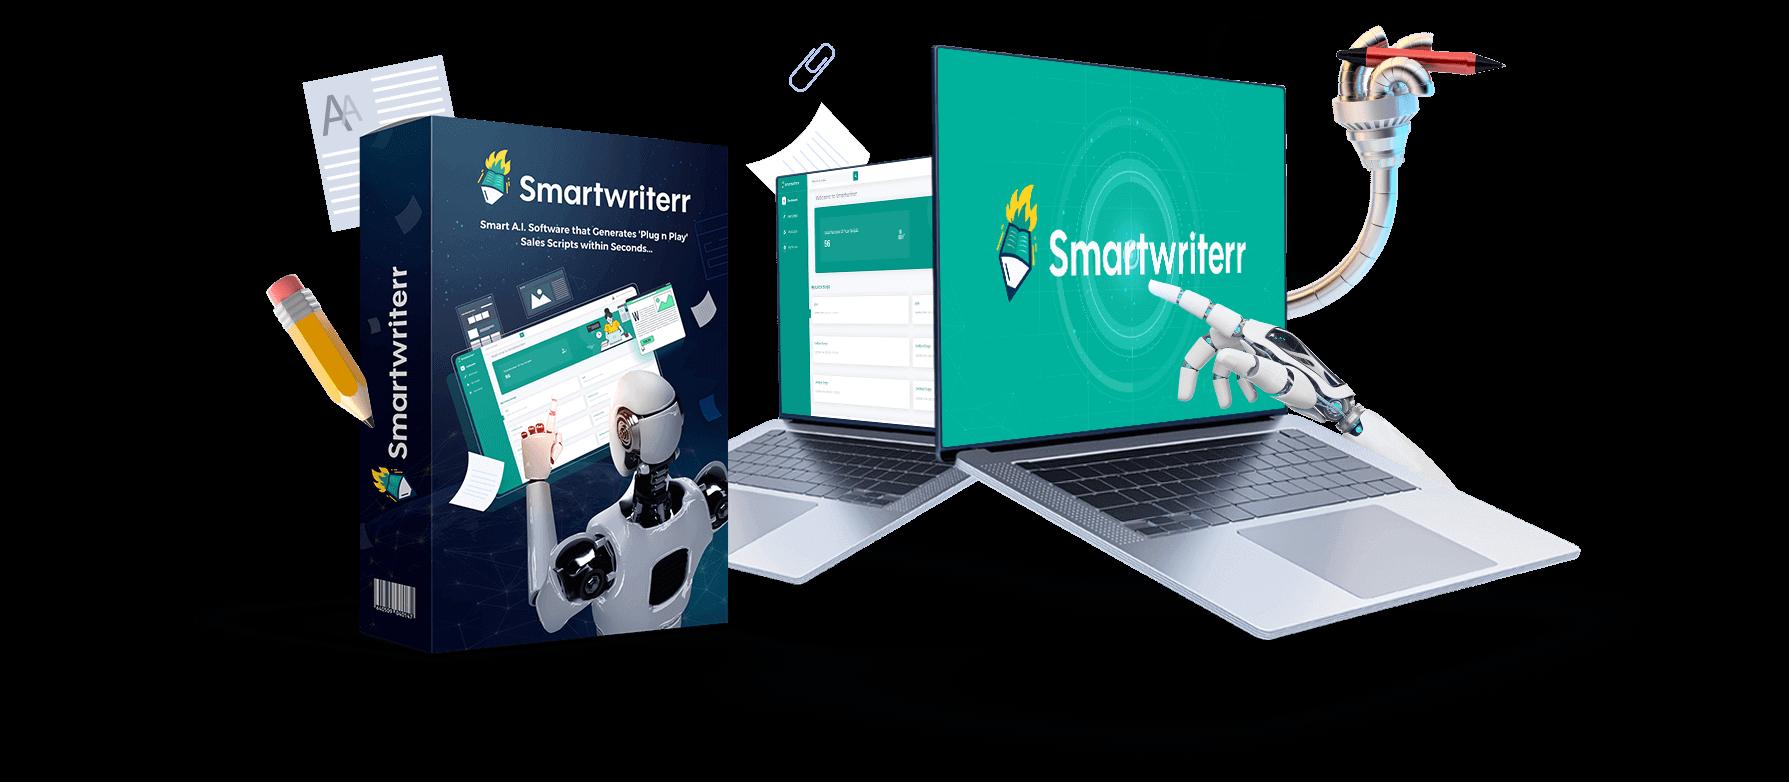 SmartWriterr-review